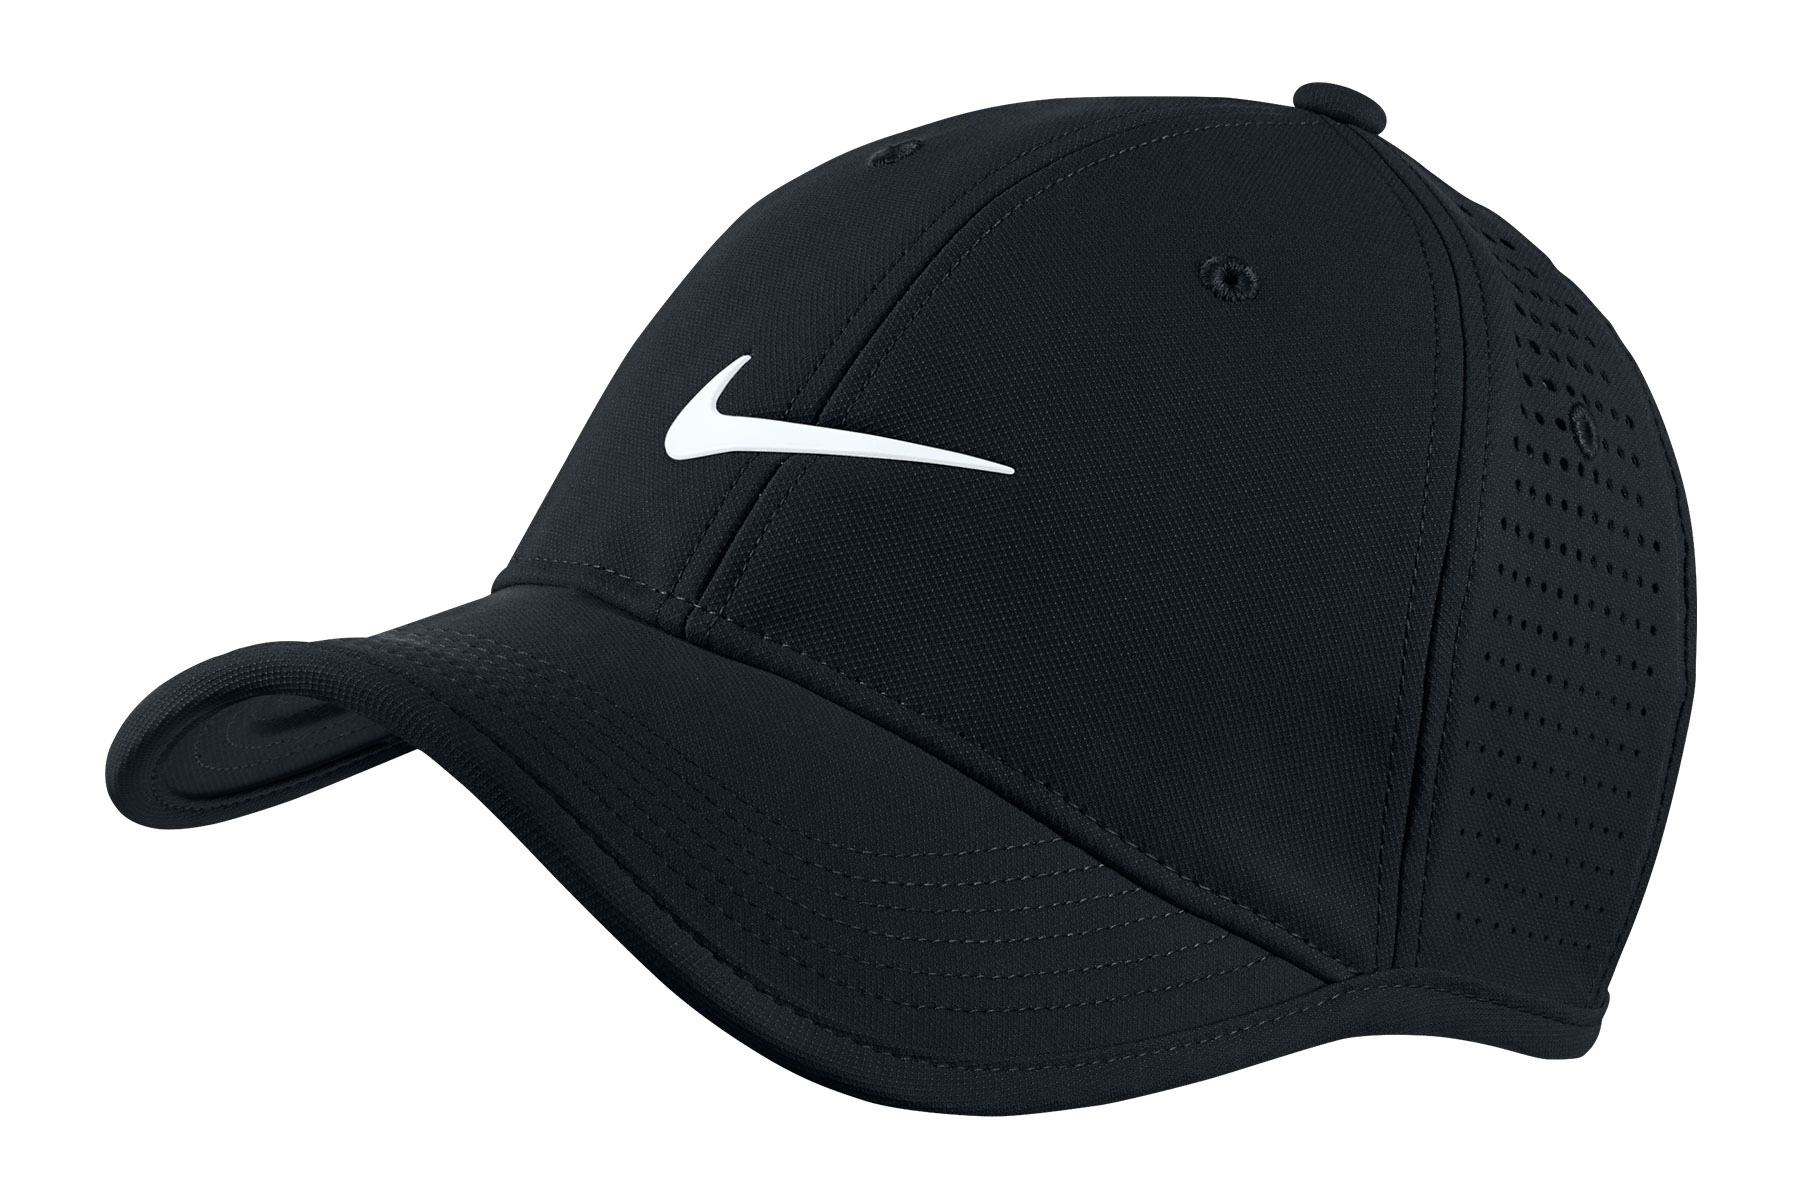 Nike Ultralight Tour Perforated Cap